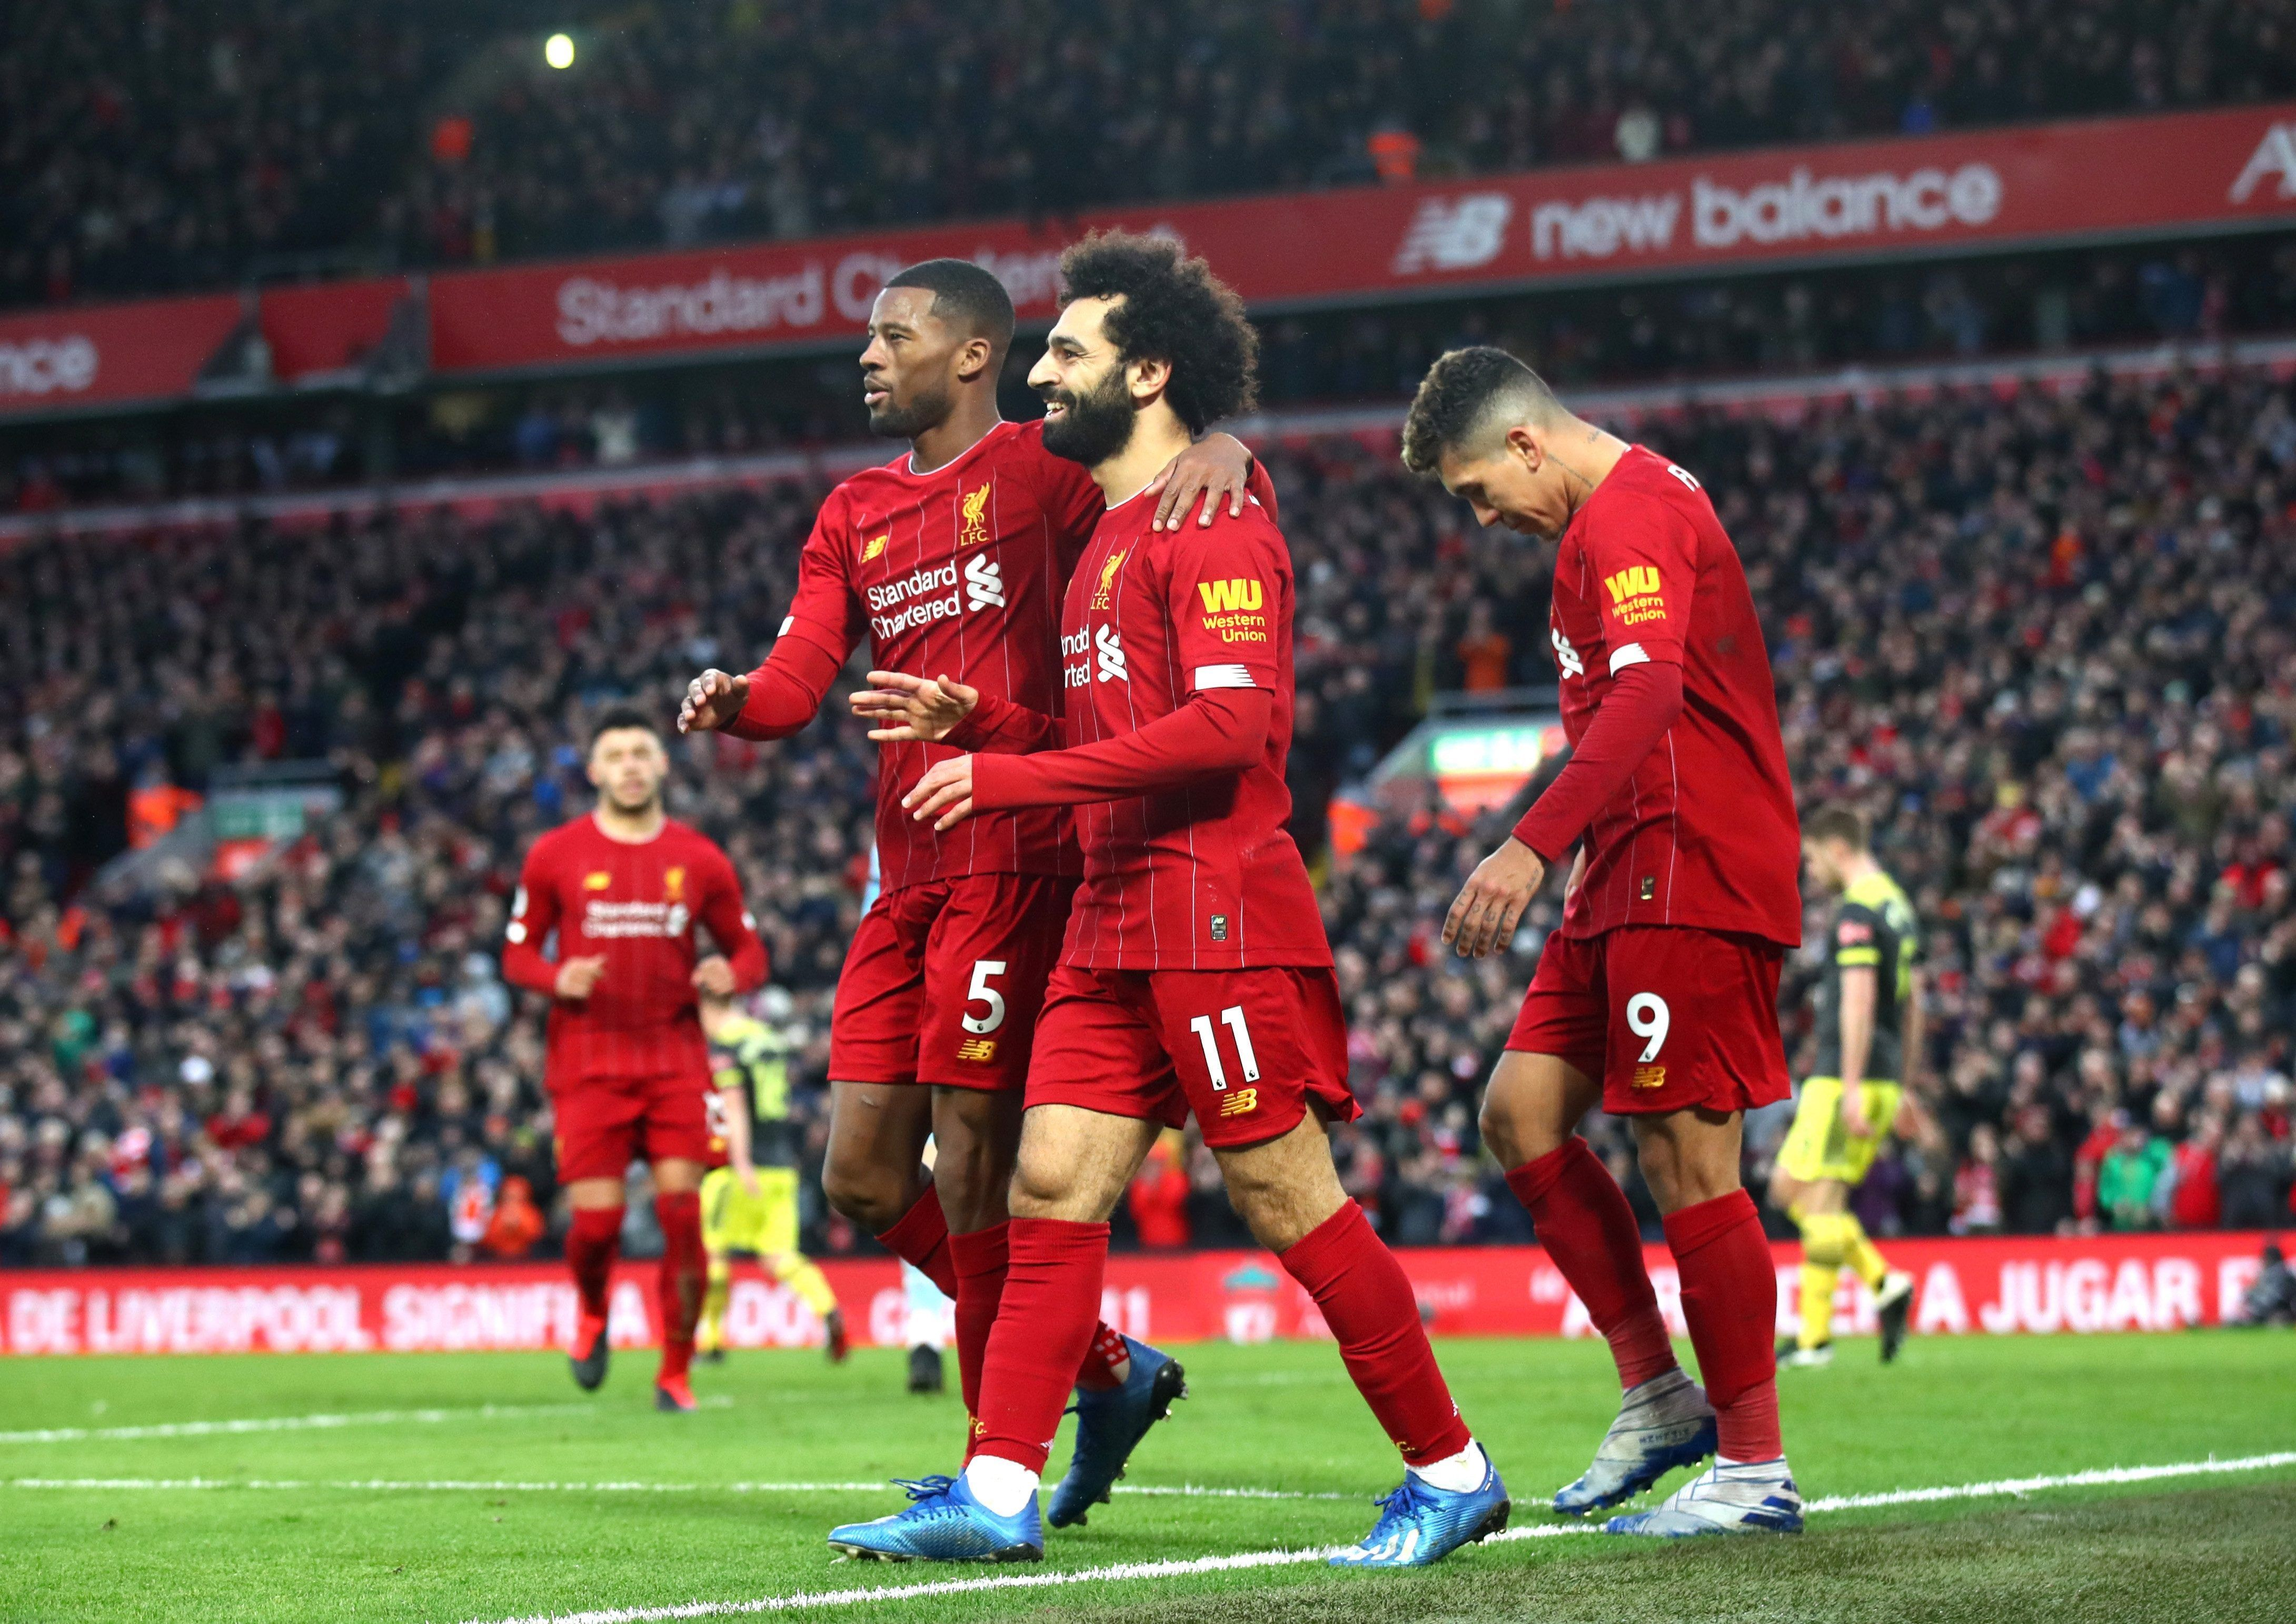 Liverpool Vs West Ham Live Stream How To Watch Premier League Fixture Tv Channel Kick Off Time Team News Footb Premier League Watch Premier League Liverpool